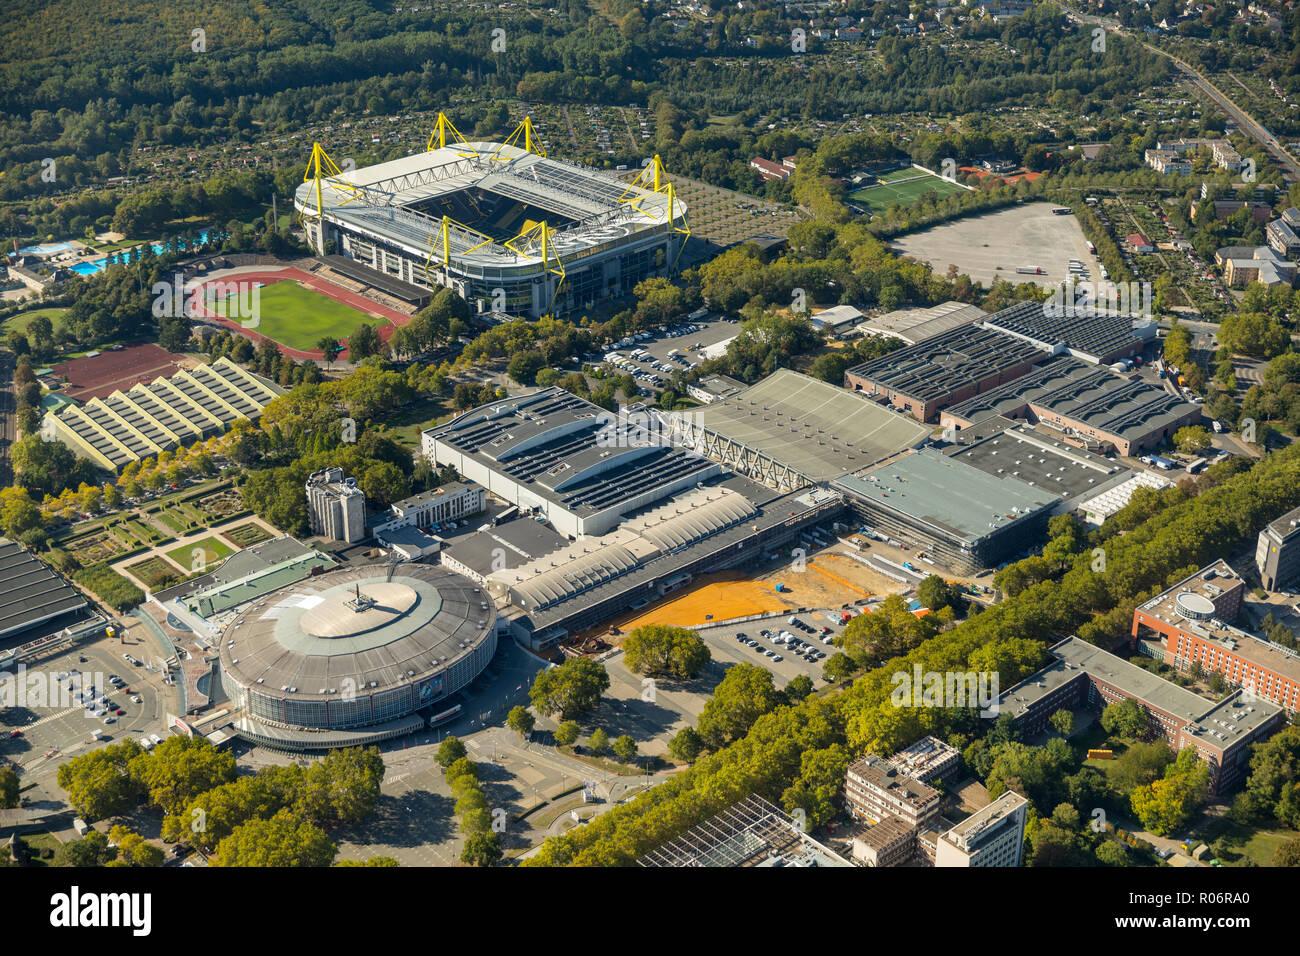 Messe Dortmund, Umbau Messeeingang, Westfalenhalle Dortmund,SignalIdunaPark, Westfalenstadion Dortmund, BVB-Stadion, Fußballstadion, , Steinerne Brück - Stock Image